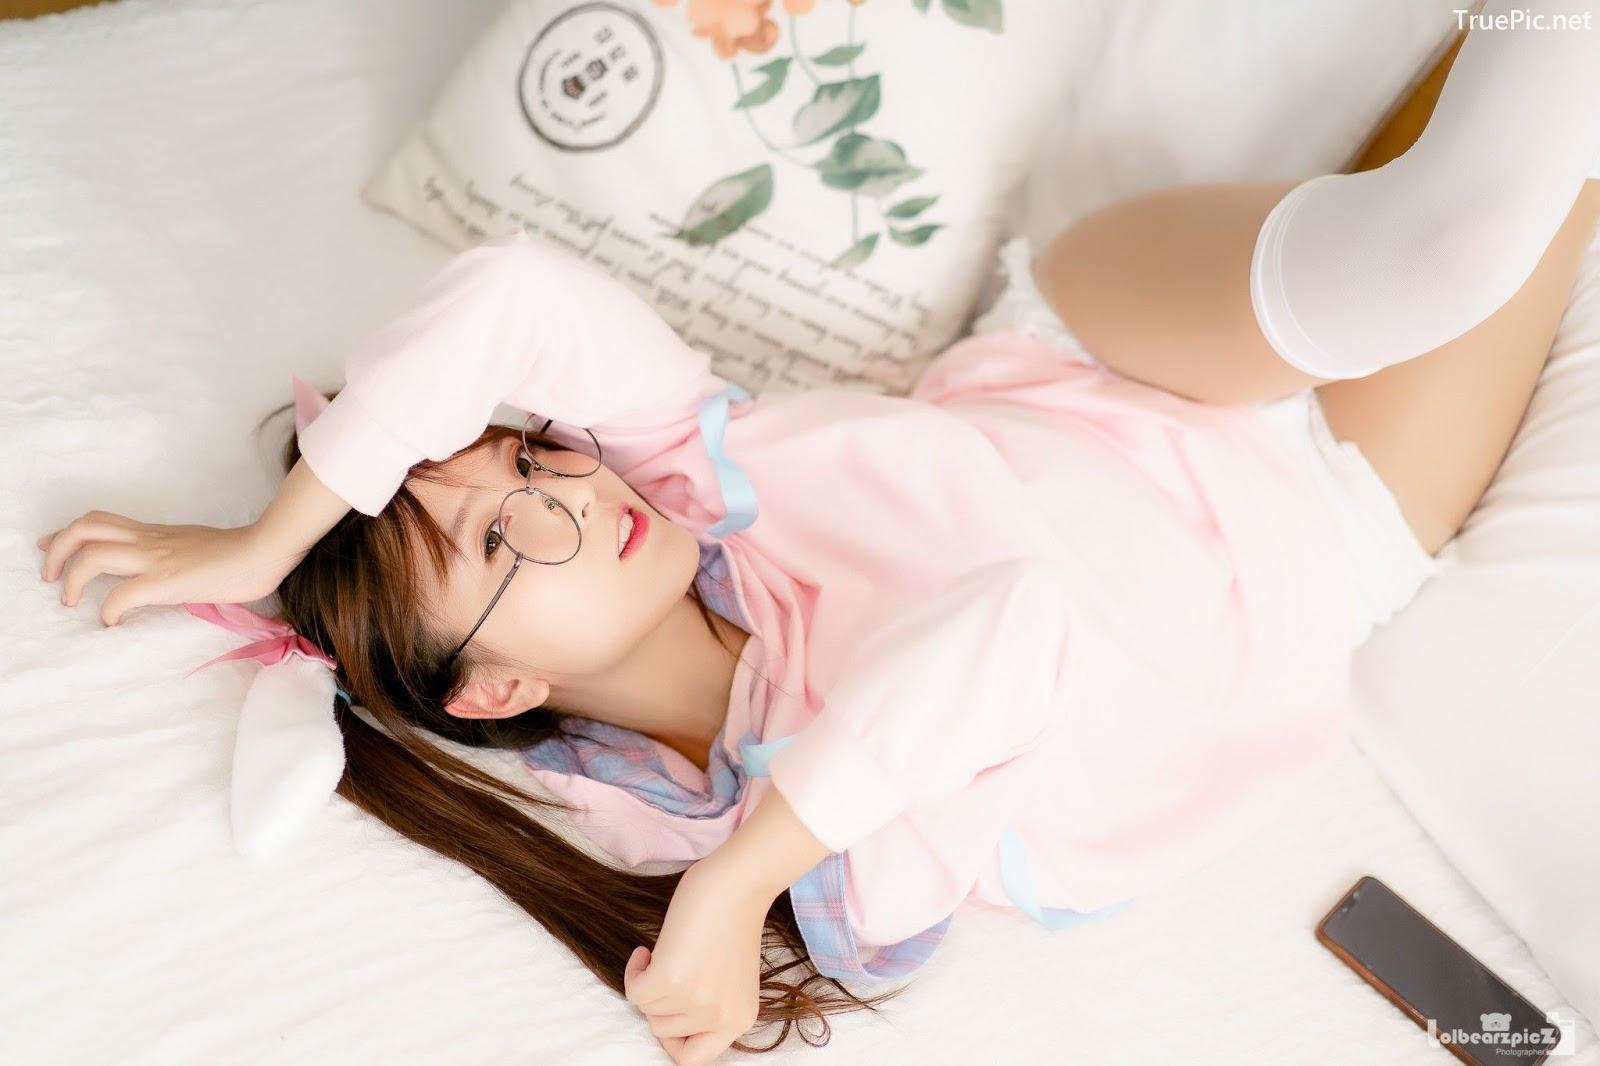 Image Thailand Model - Phunnita Intarapimai - Cute Rabbit Girl - TruePic.net - Picture-4